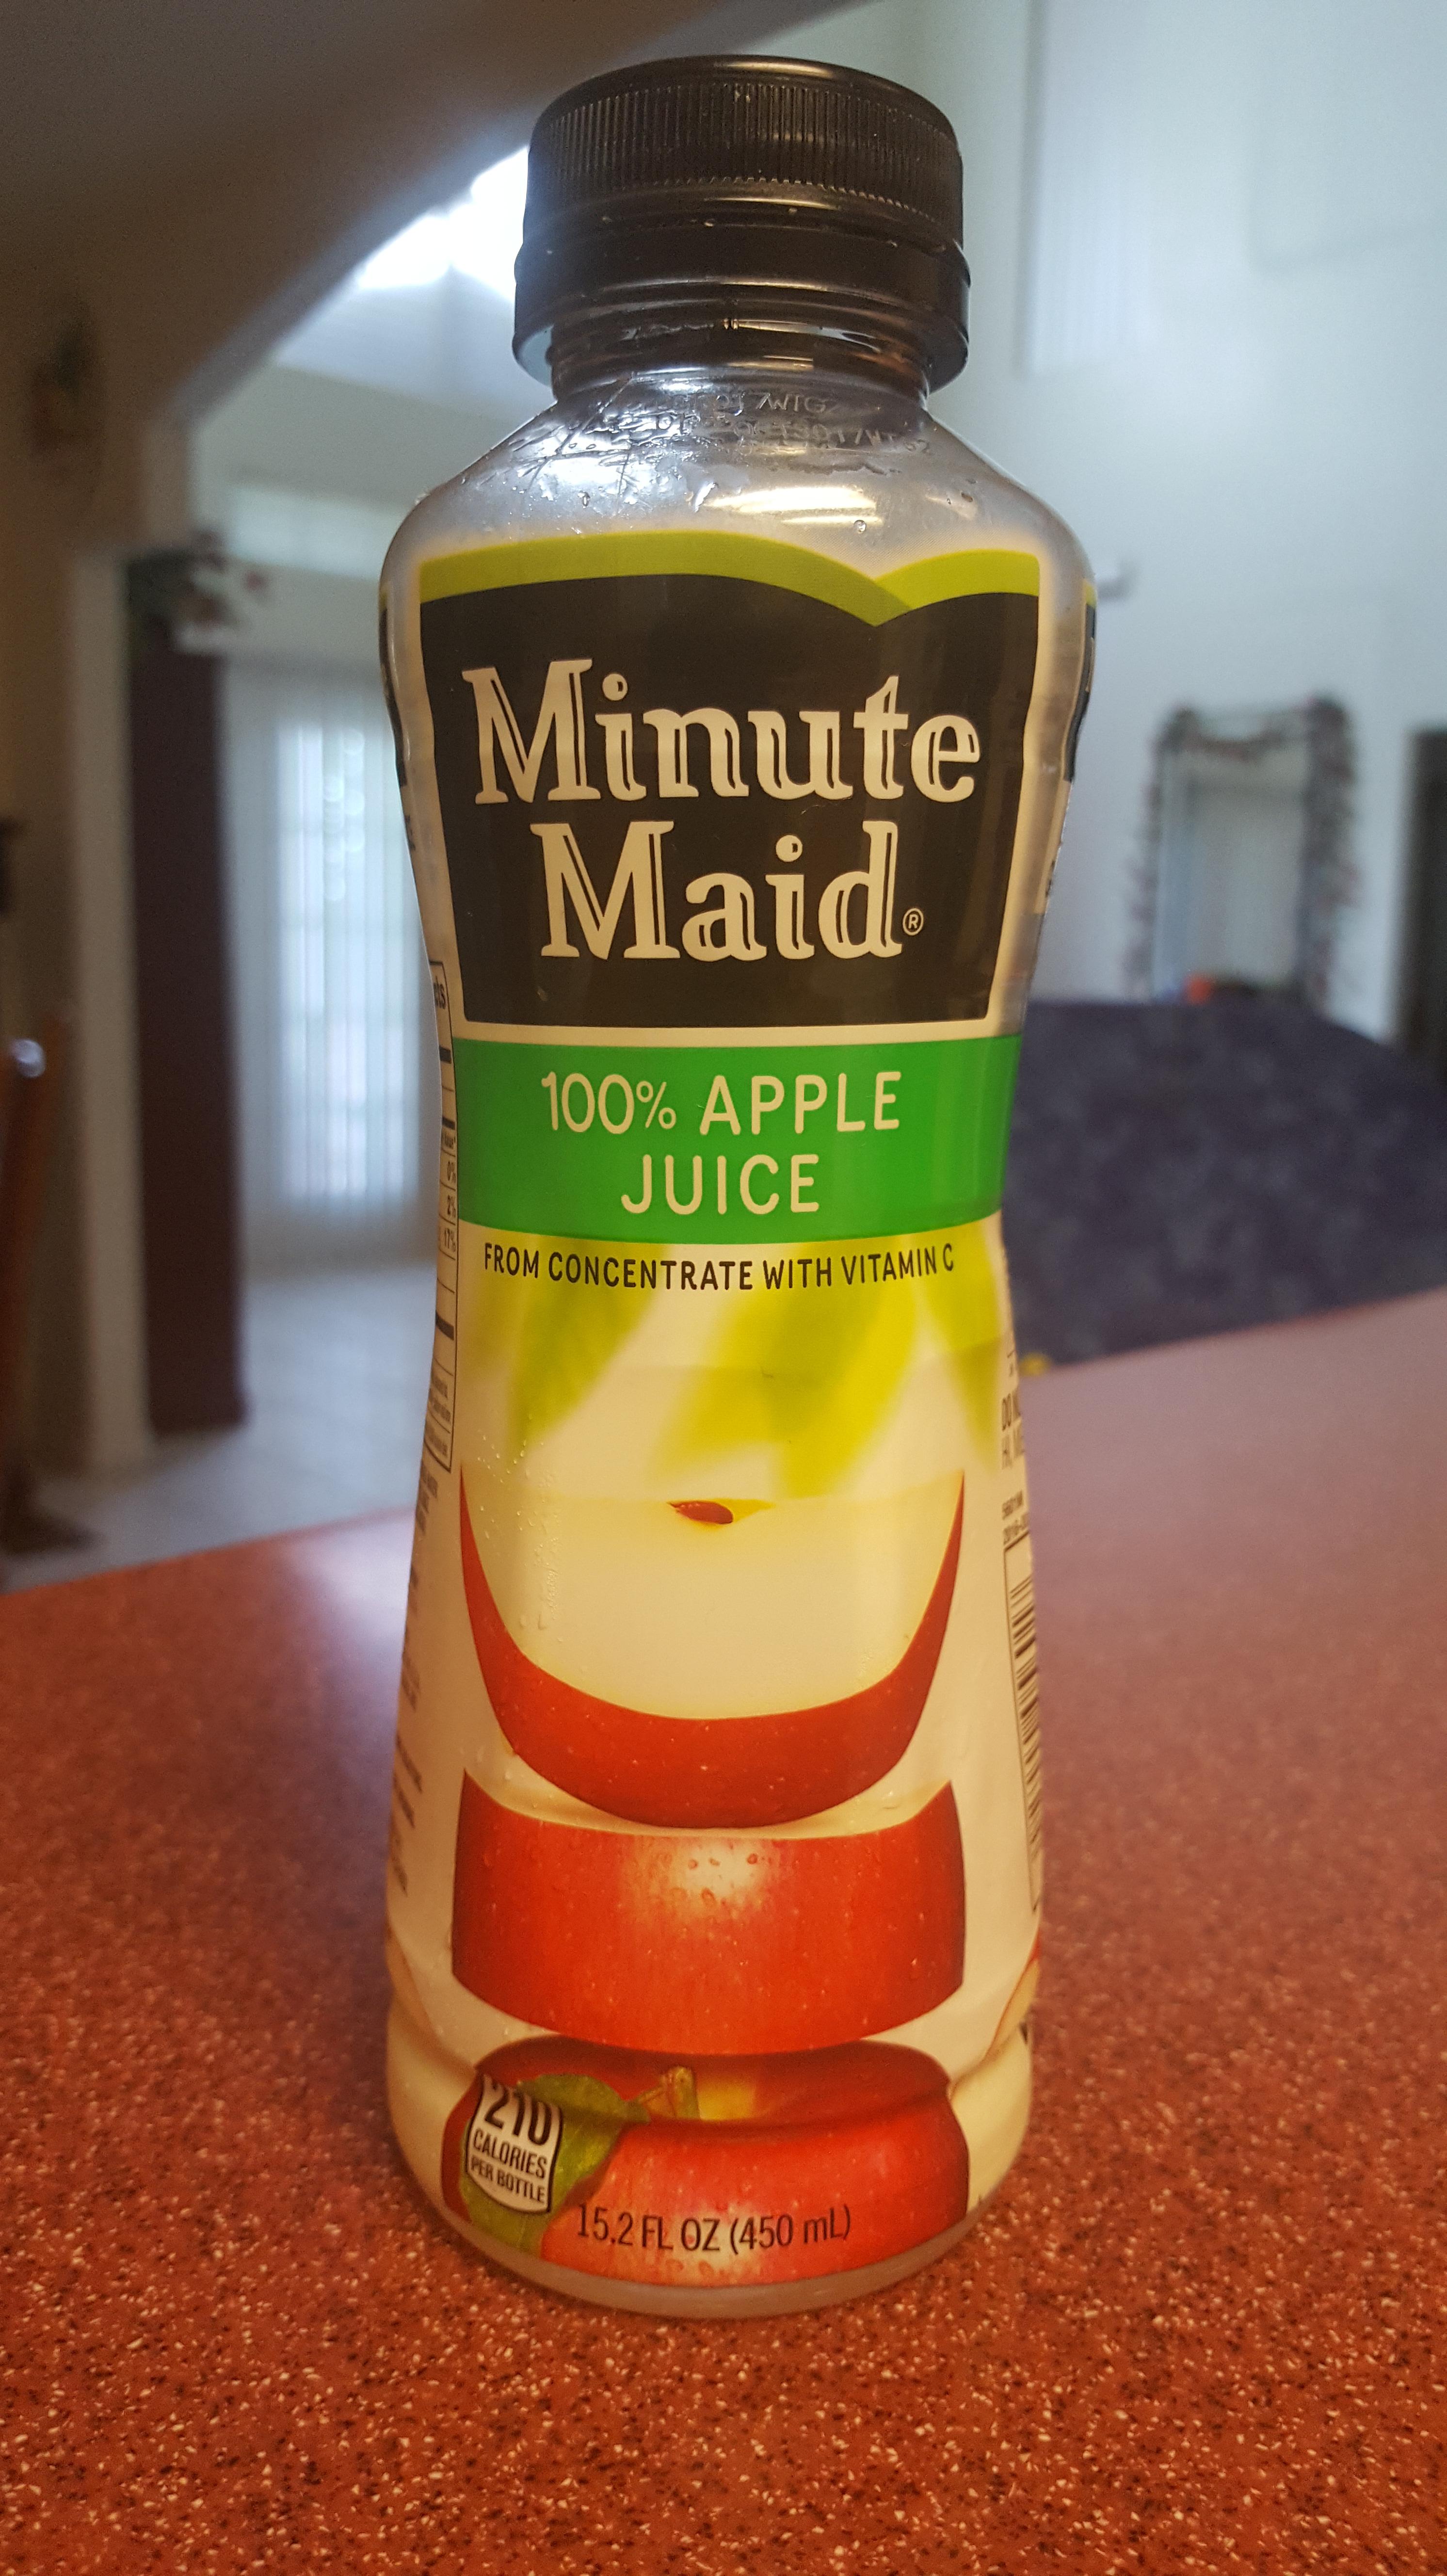 Apple juice won't treat psoriasis